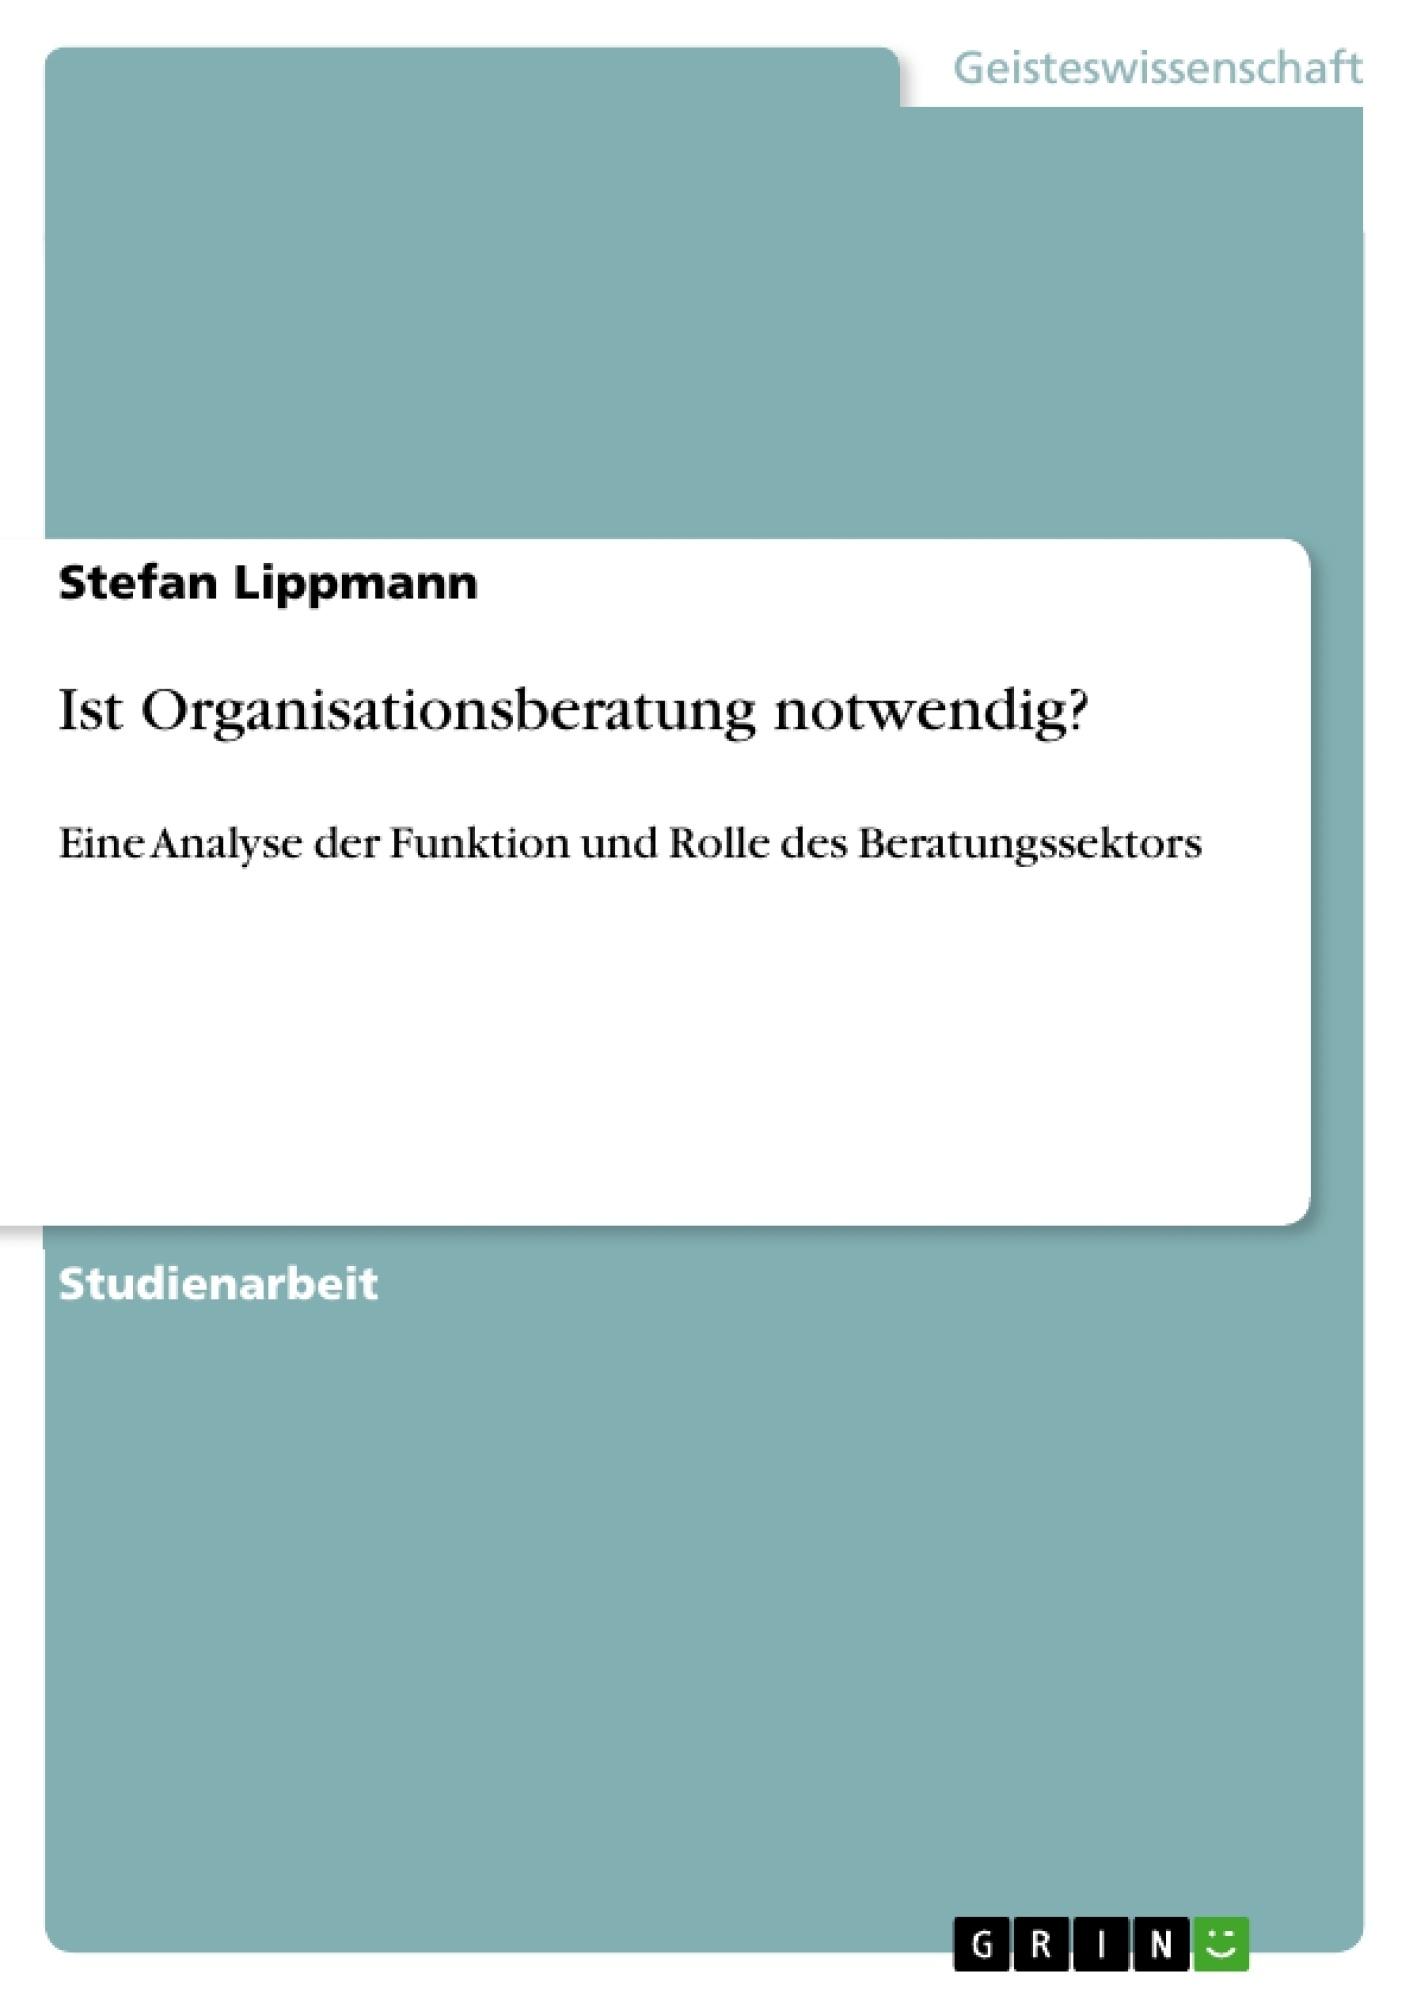 Titel: Ist Organisationsberatung notwendig?